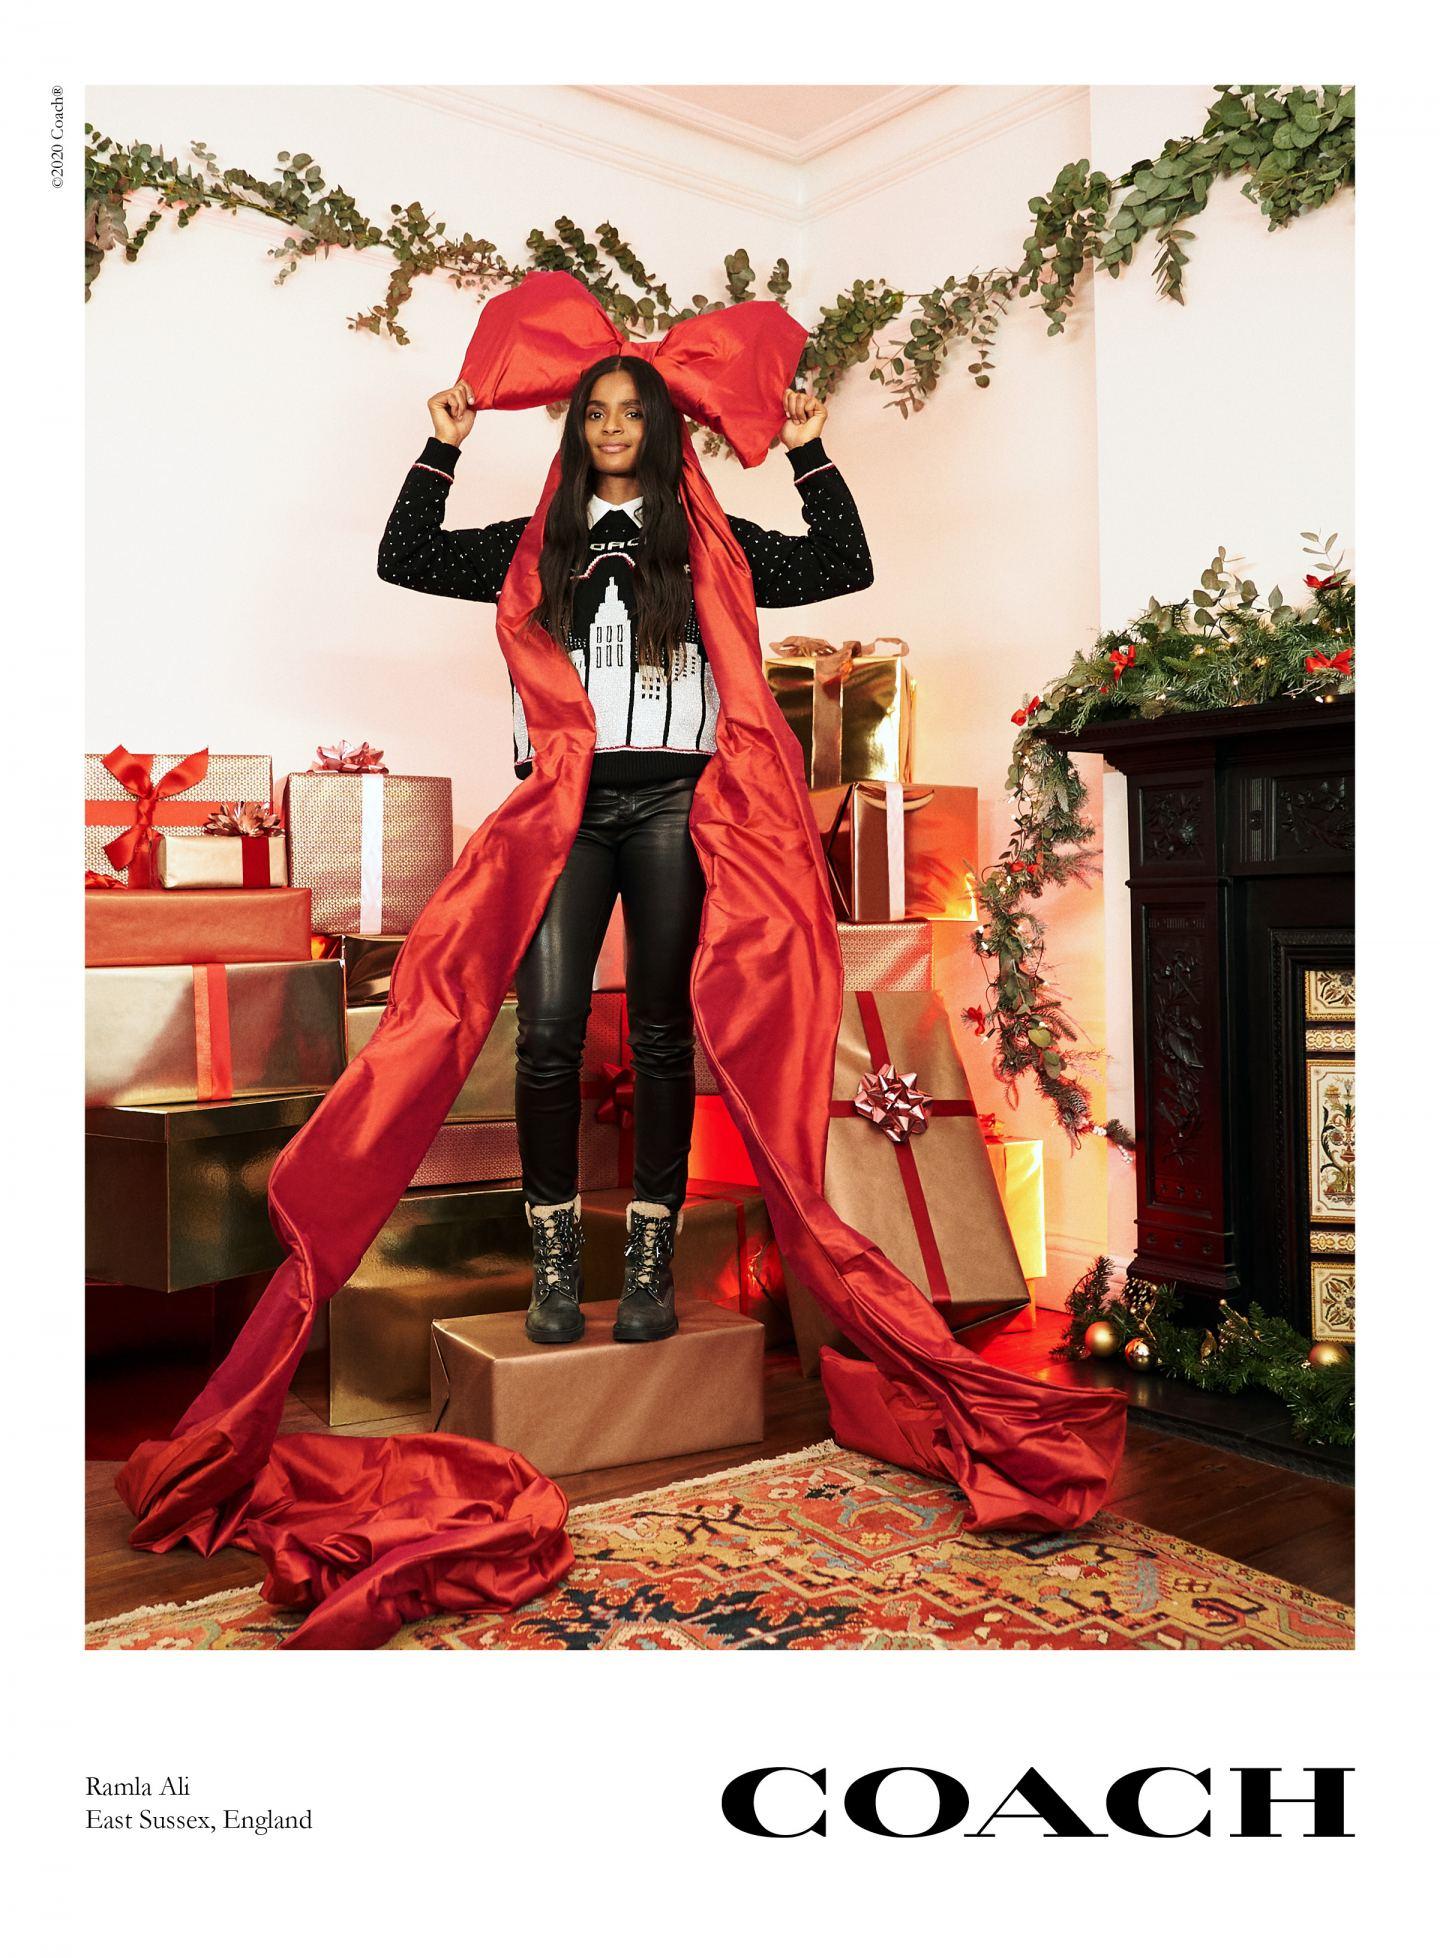 Ramla Ali_coach new york christmas campaign 2020